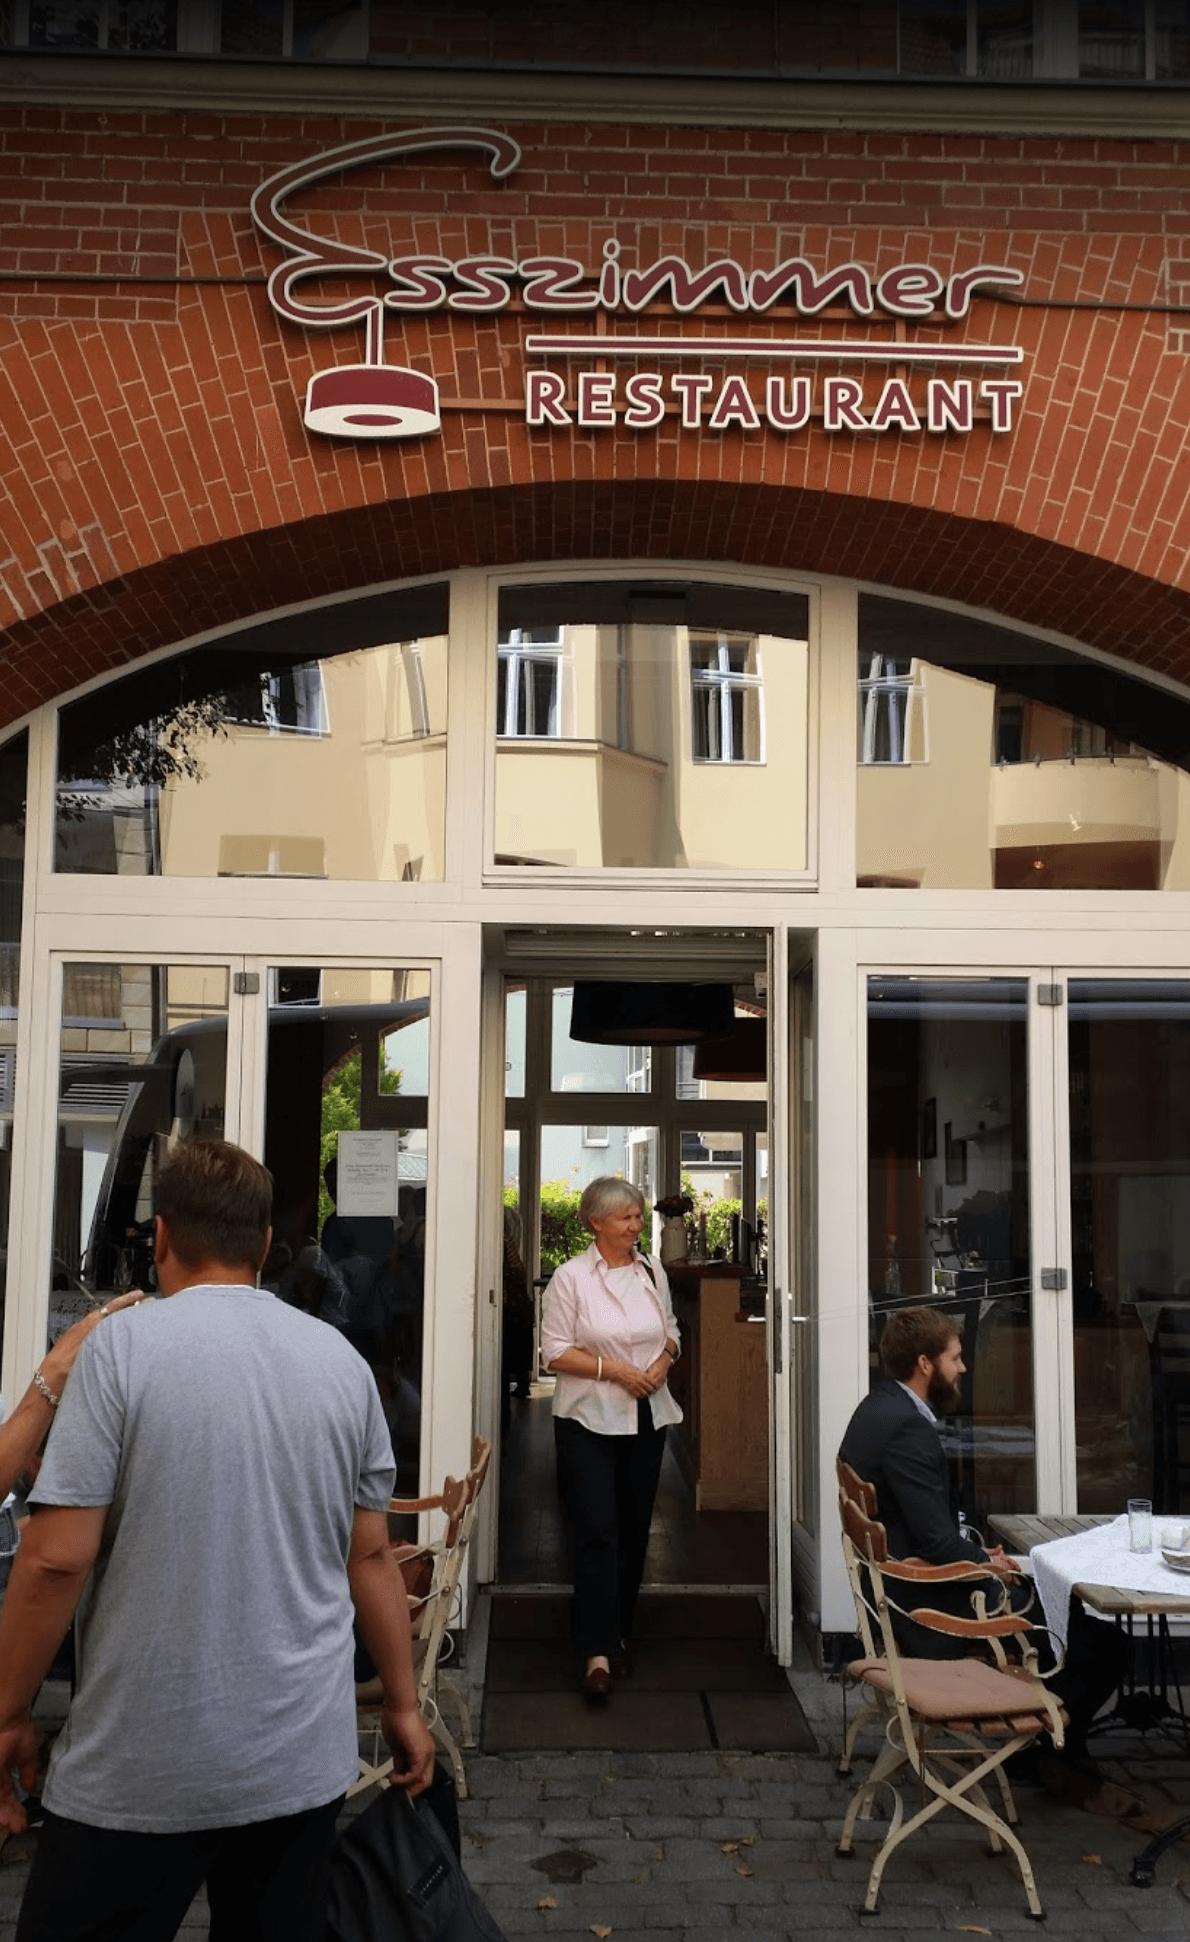 Esszimmer restaurant berlin for Esszimmer berlin restaurant